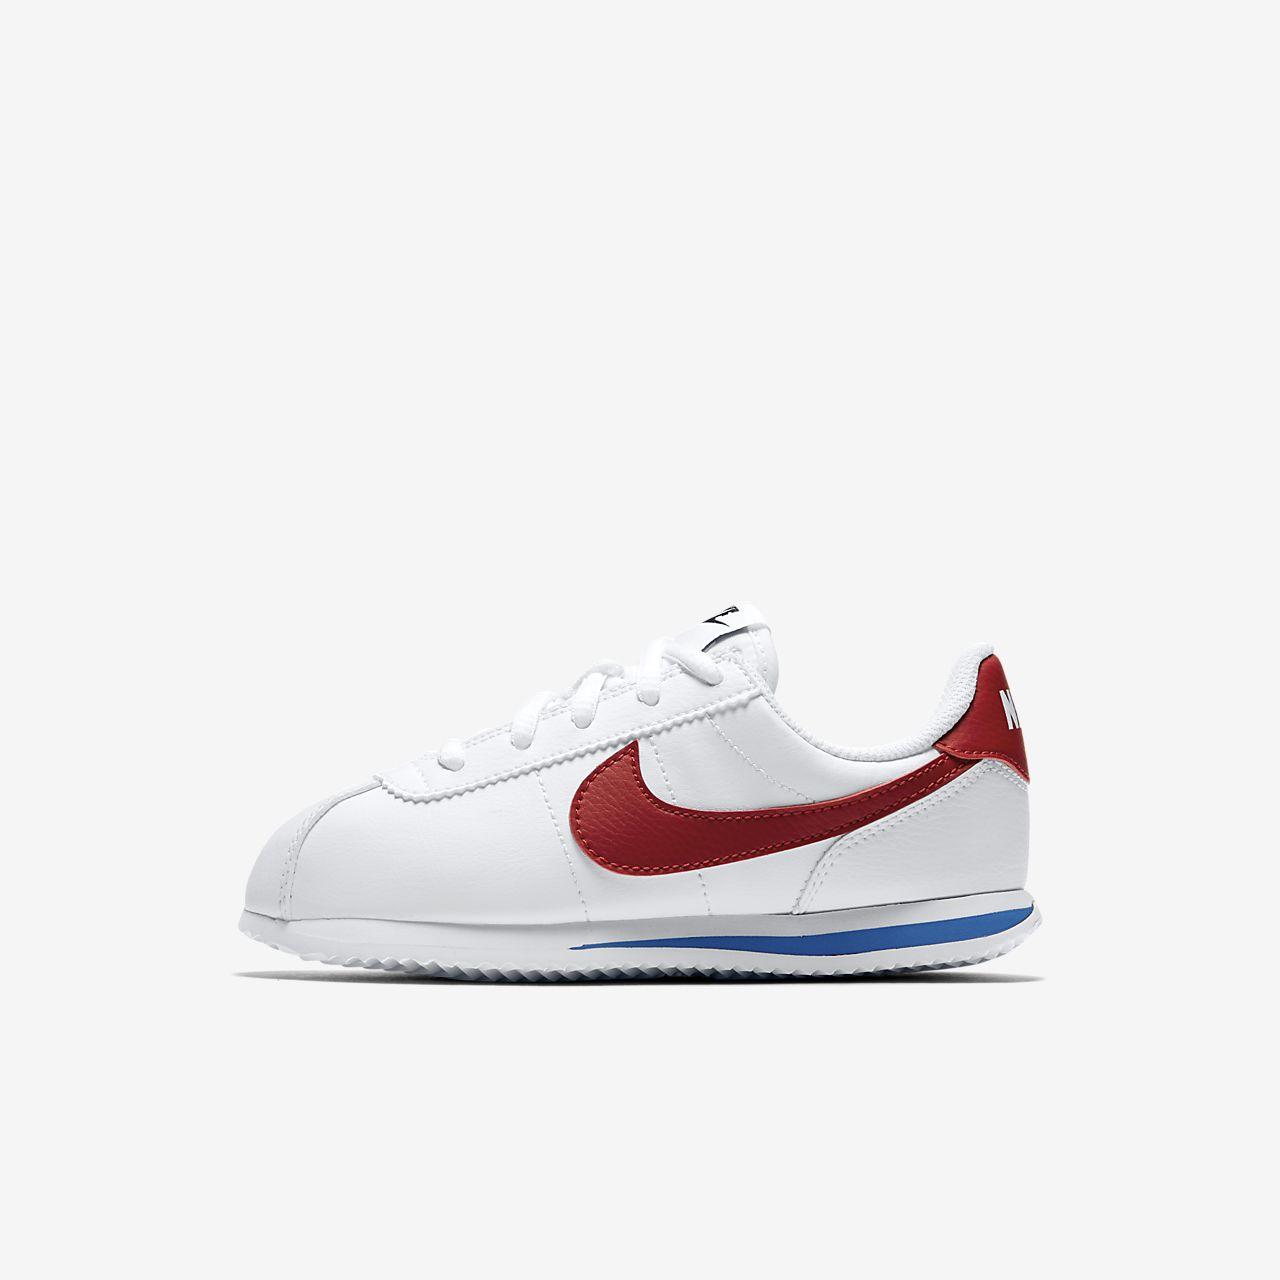 nike cortez flyknit vente chaussures pour vente flyknit f9d88a